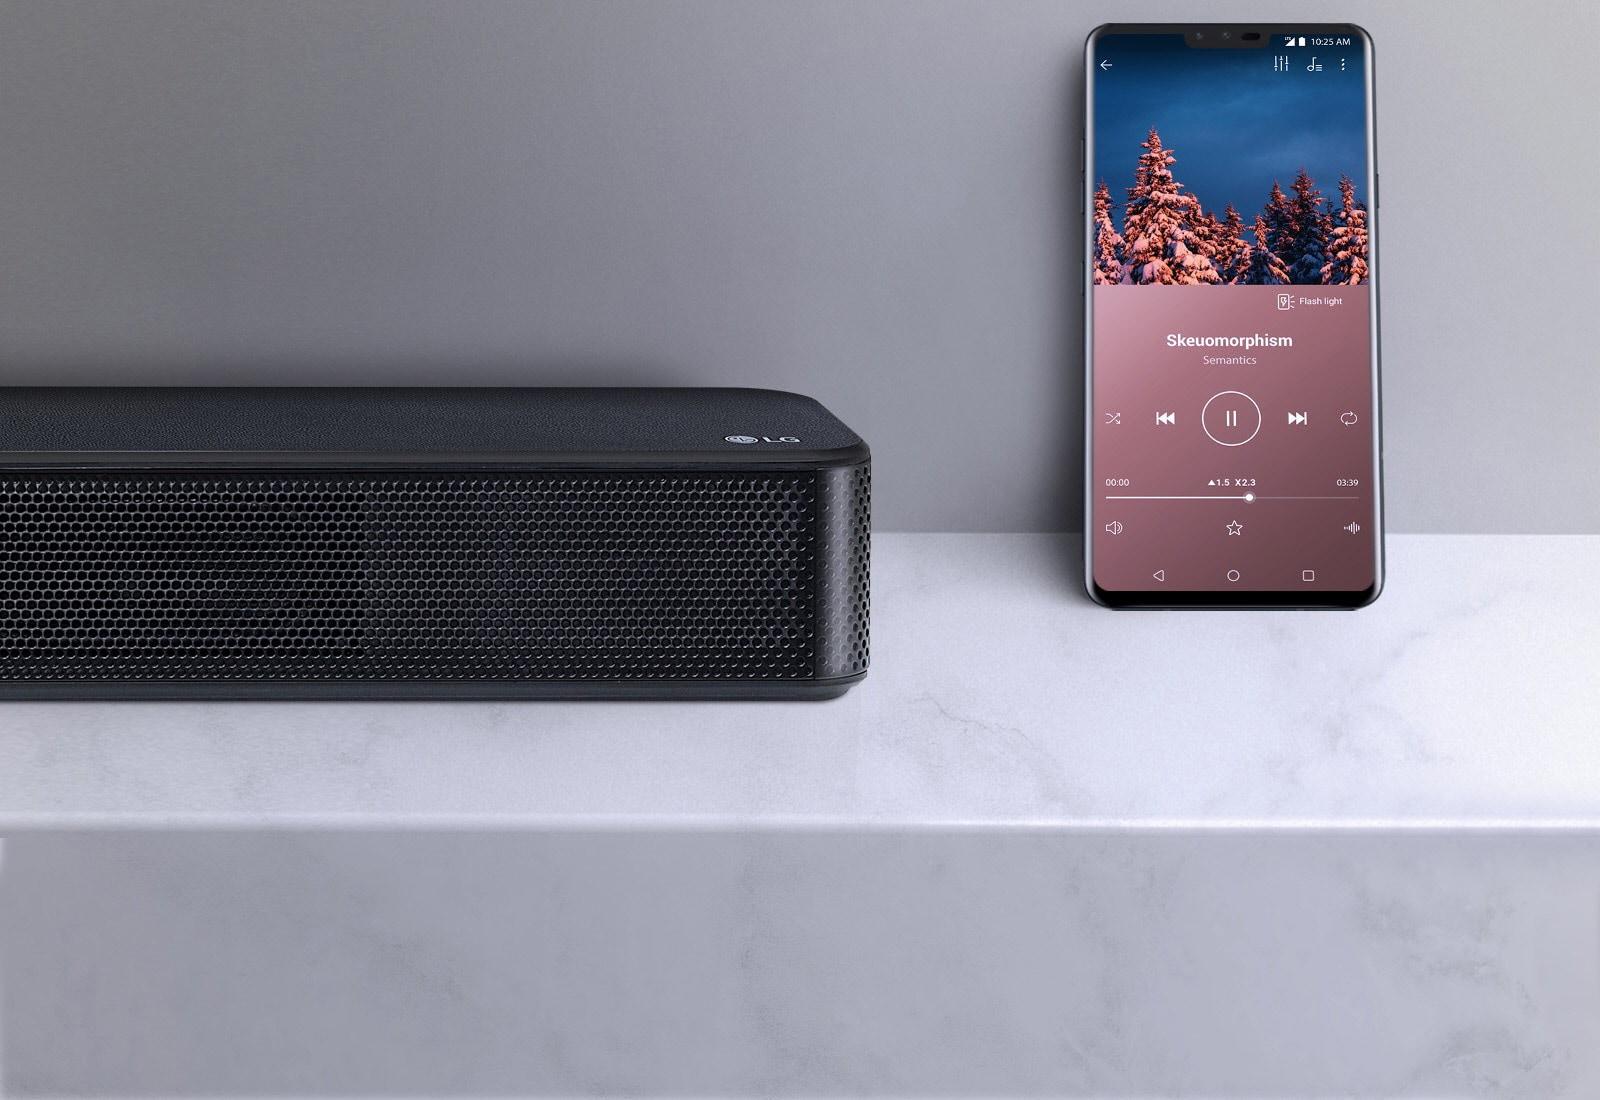 SL5Y Going Wireless Is Effortless - soundbar next a smart phone